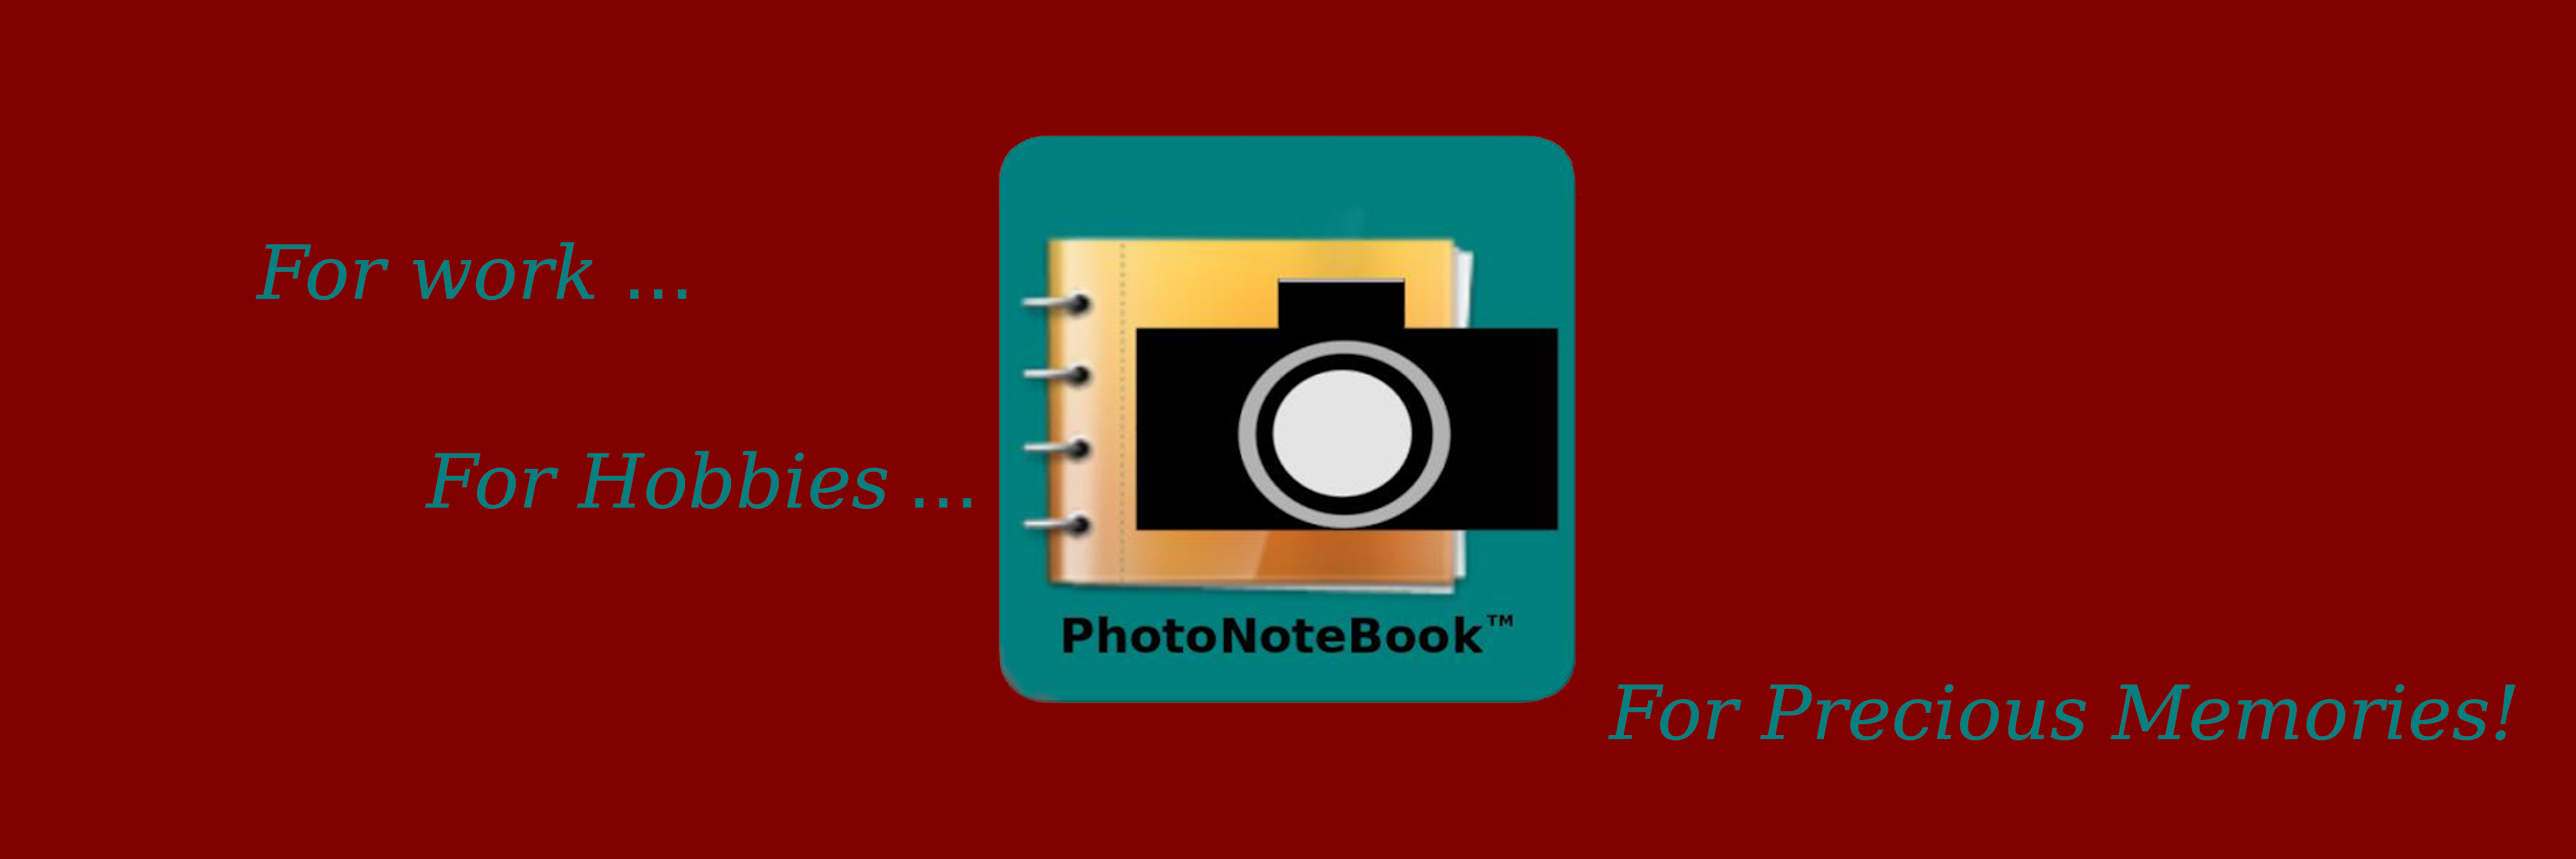 PhotoNoteBook™ banner